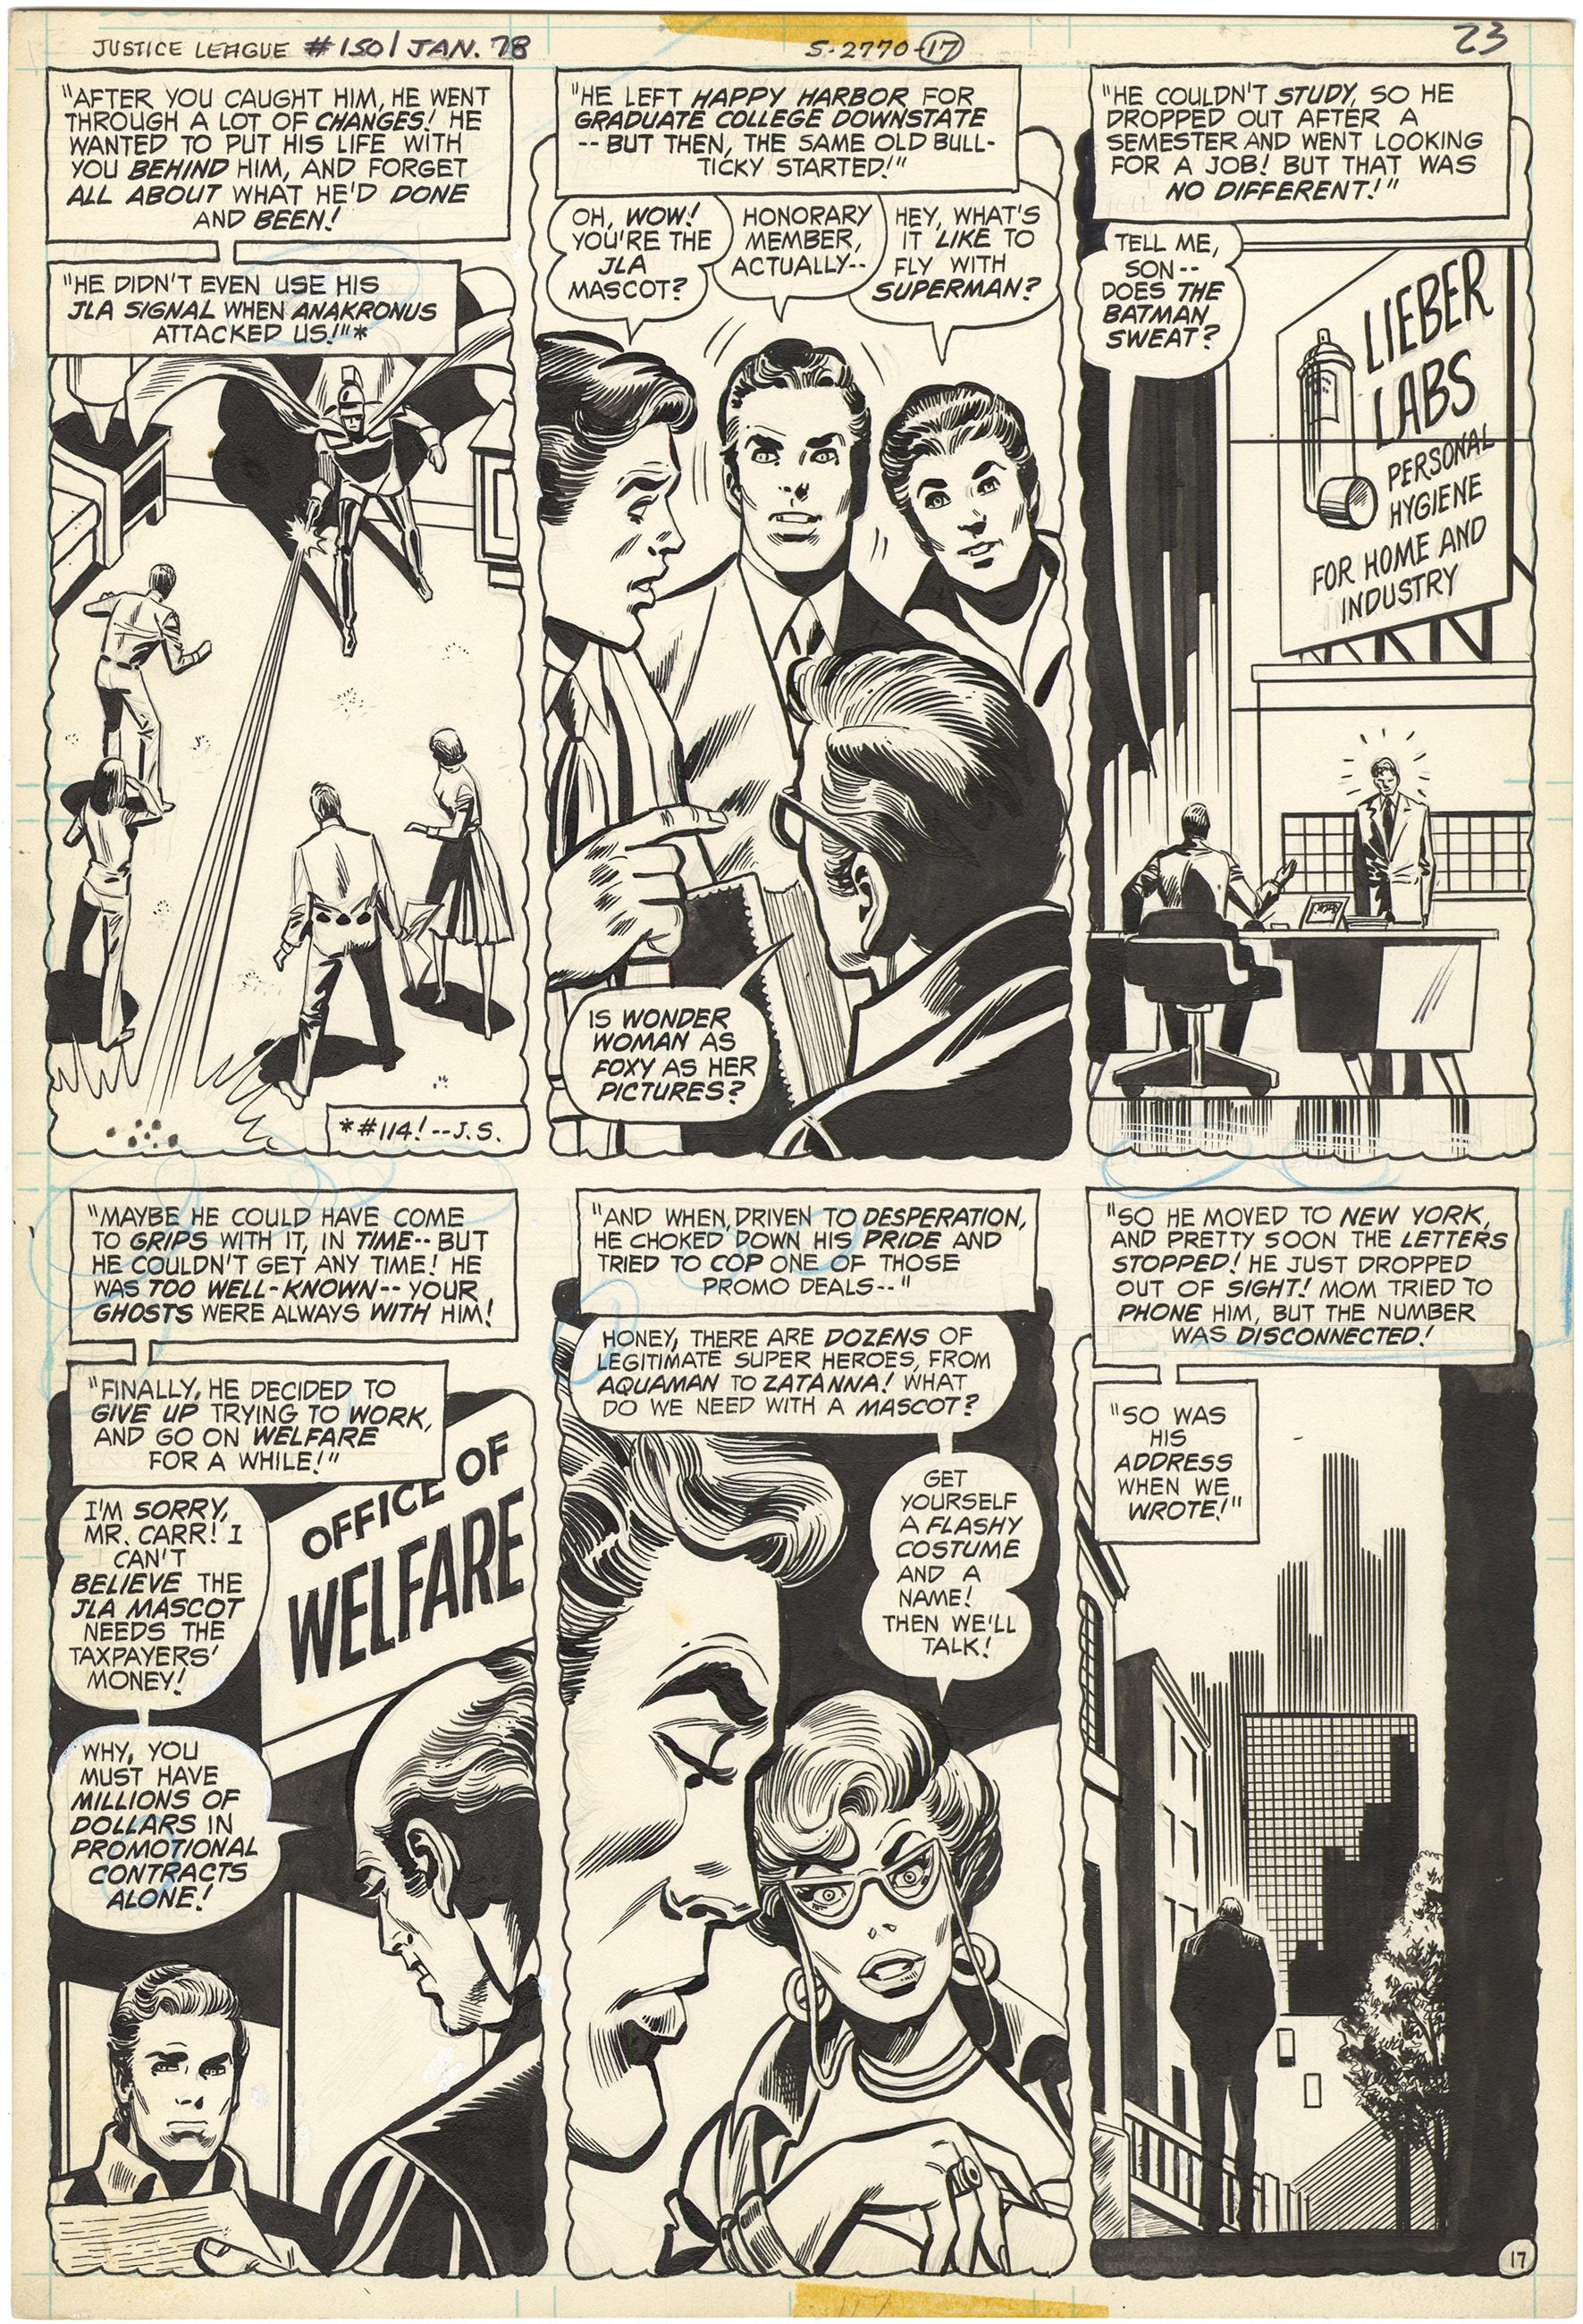 Justice League of America #150 p17